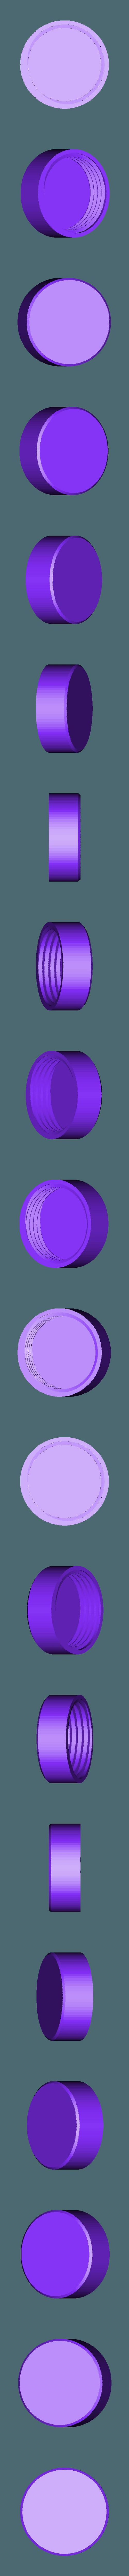 lid.stl Download free STL file McCormick Spice Jar Lid • 3D print template, donek